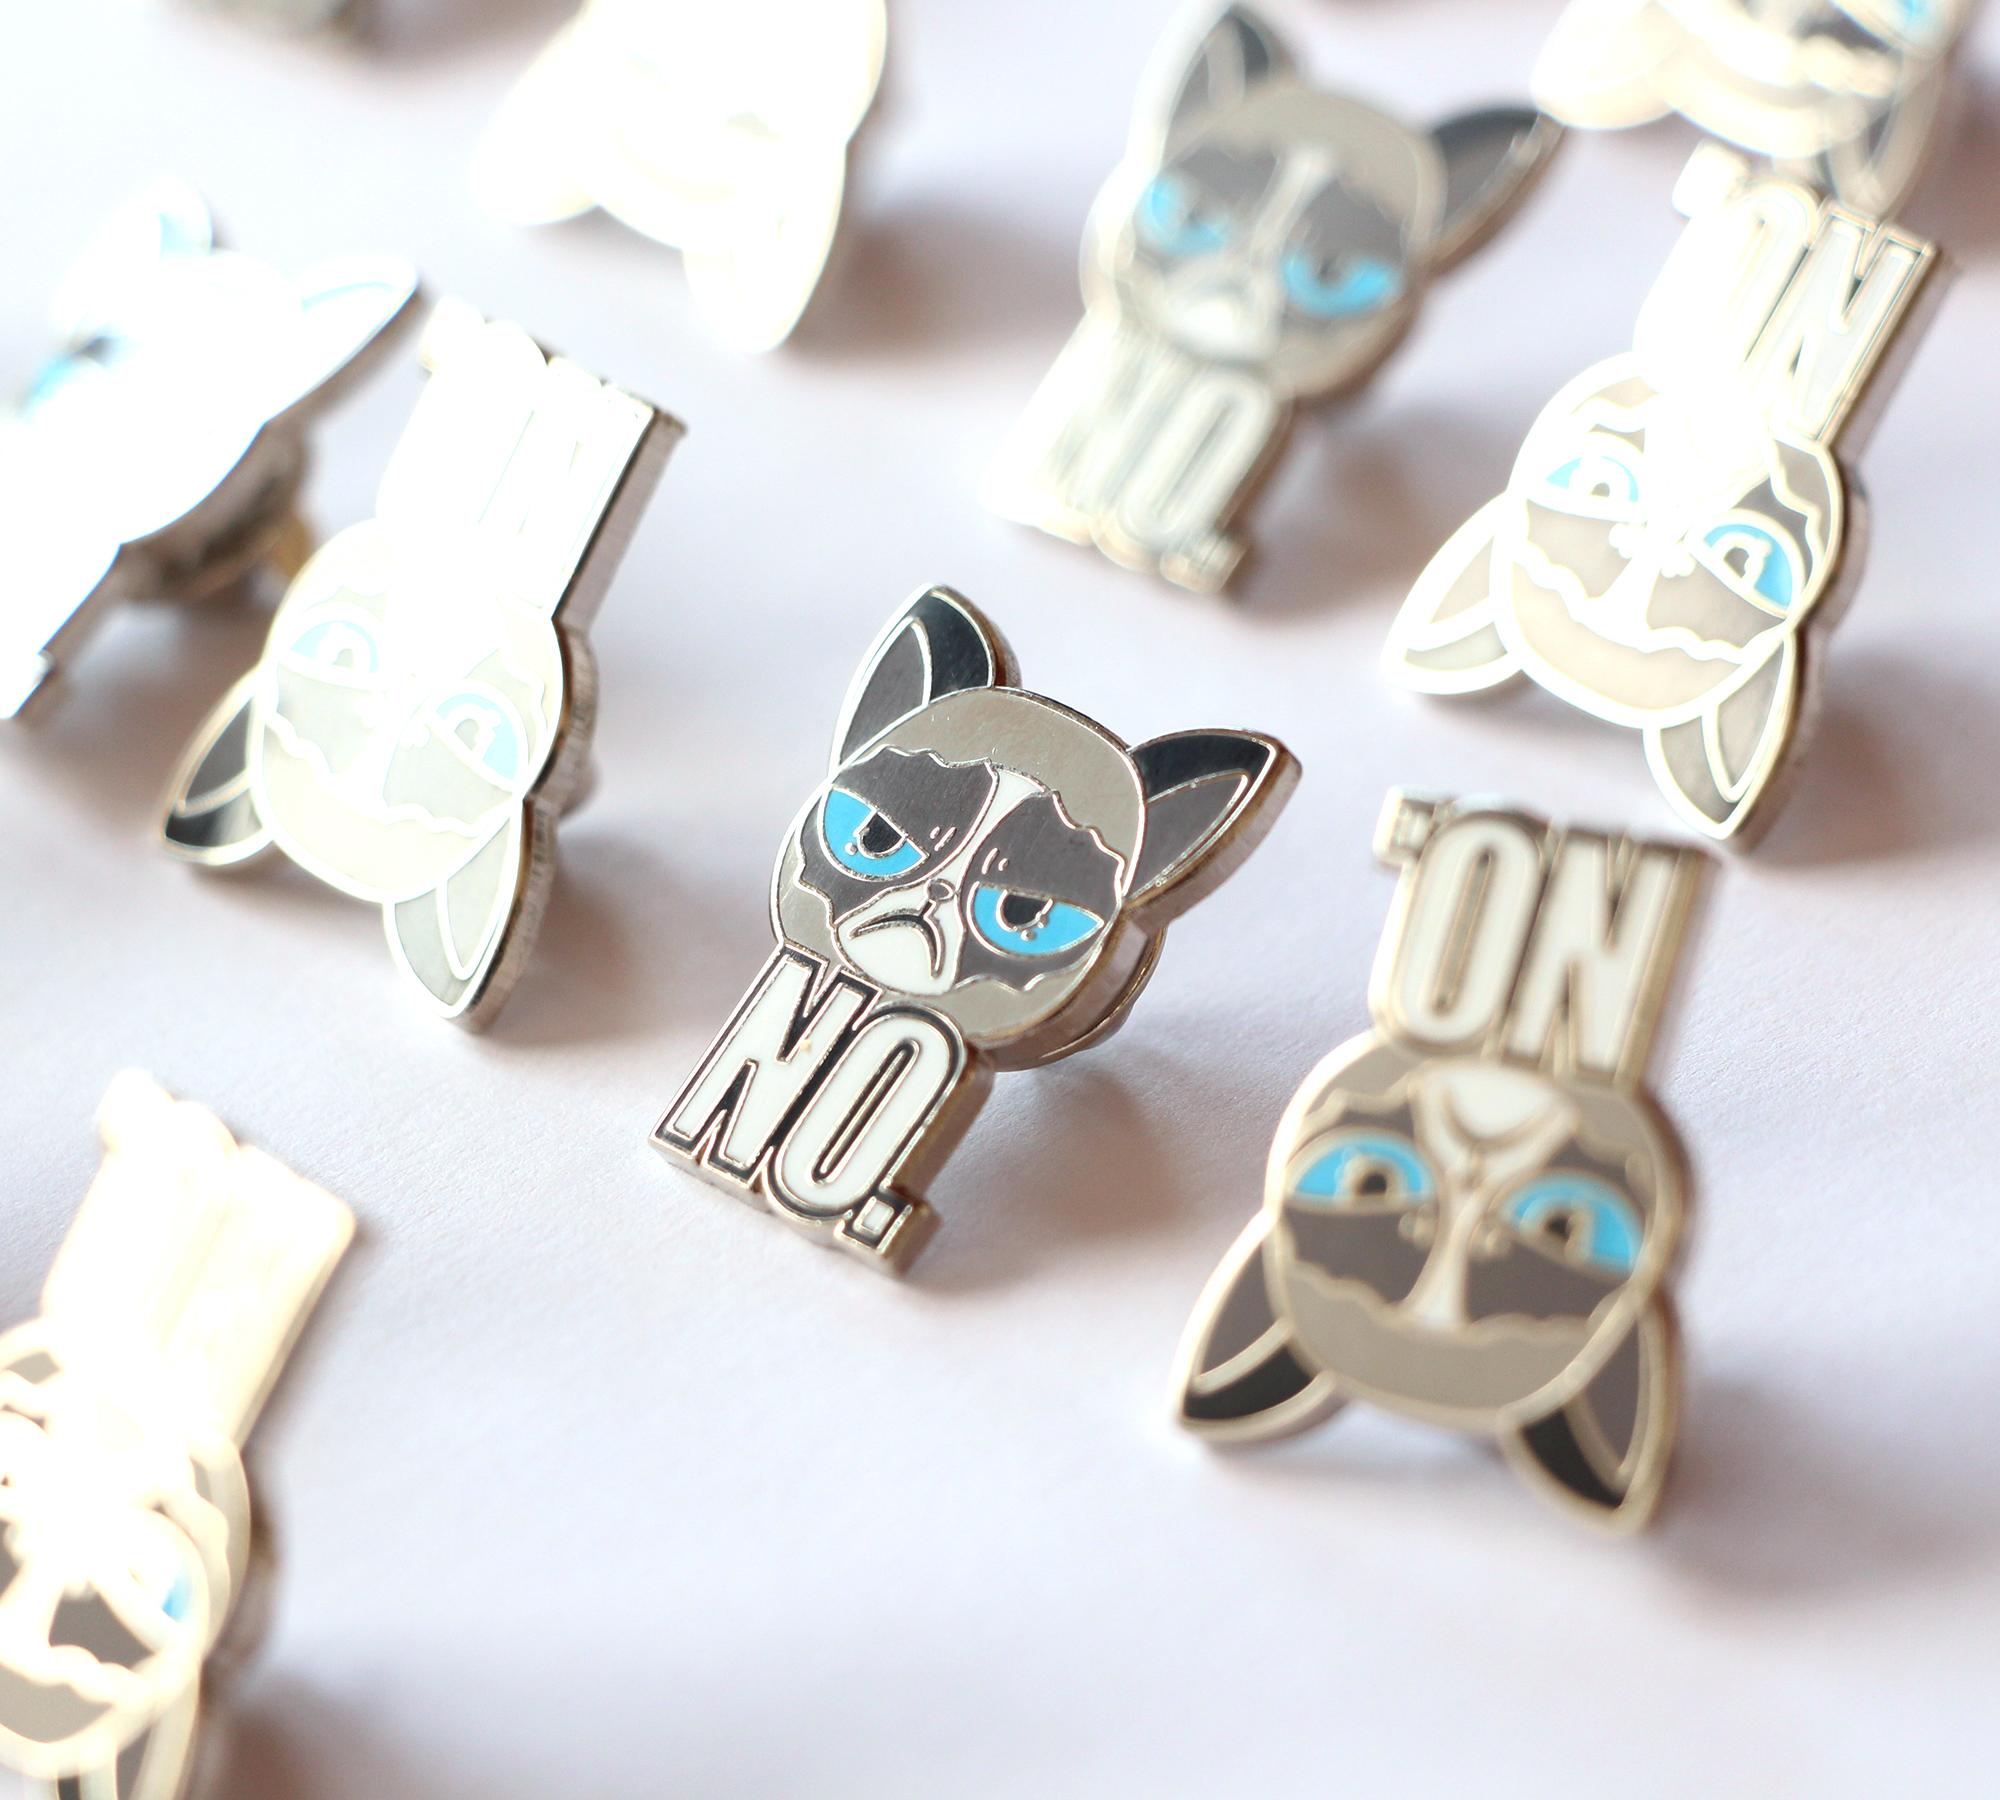 Angry Cat NO. $10.00. Enamel Pin